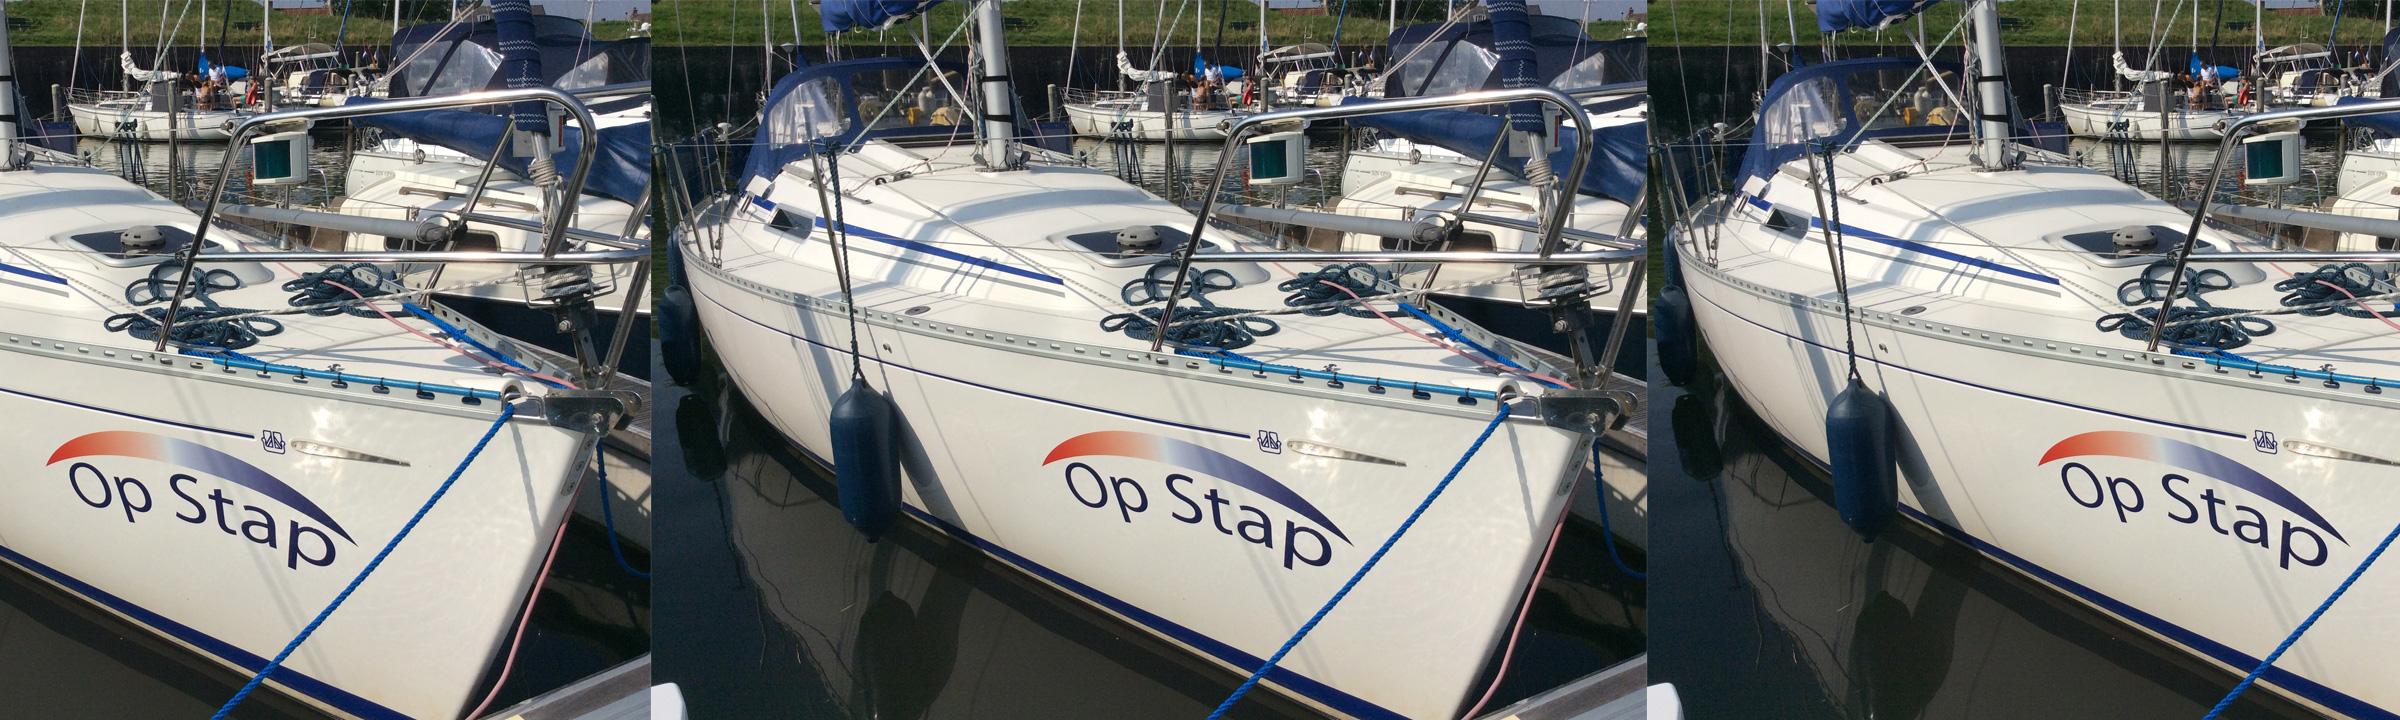 Op Stap in Nederland